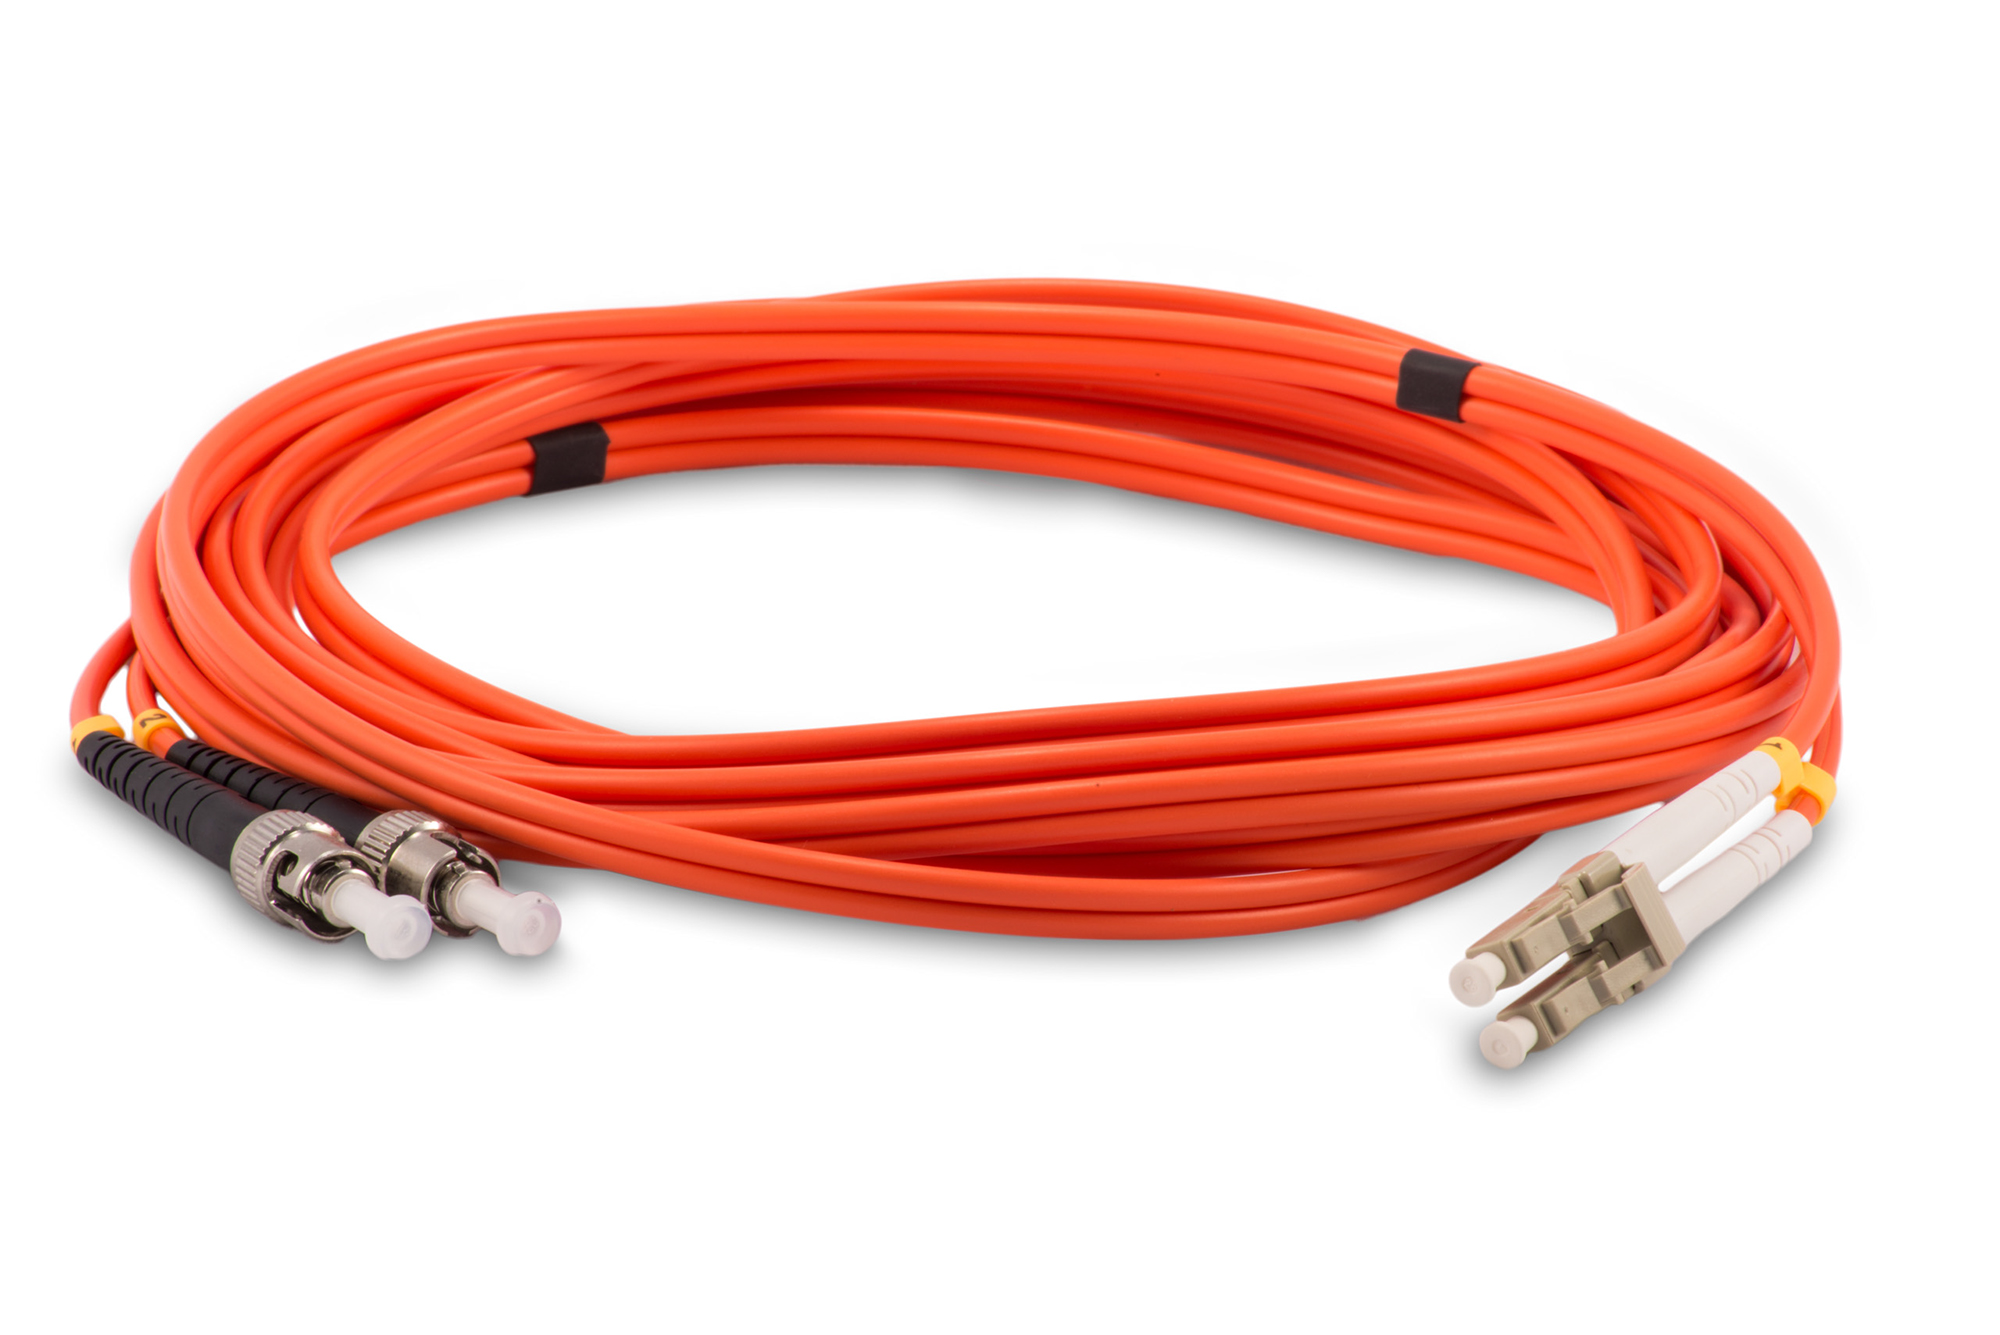 Fiber optic patch cables cables 625u125 sciox Images